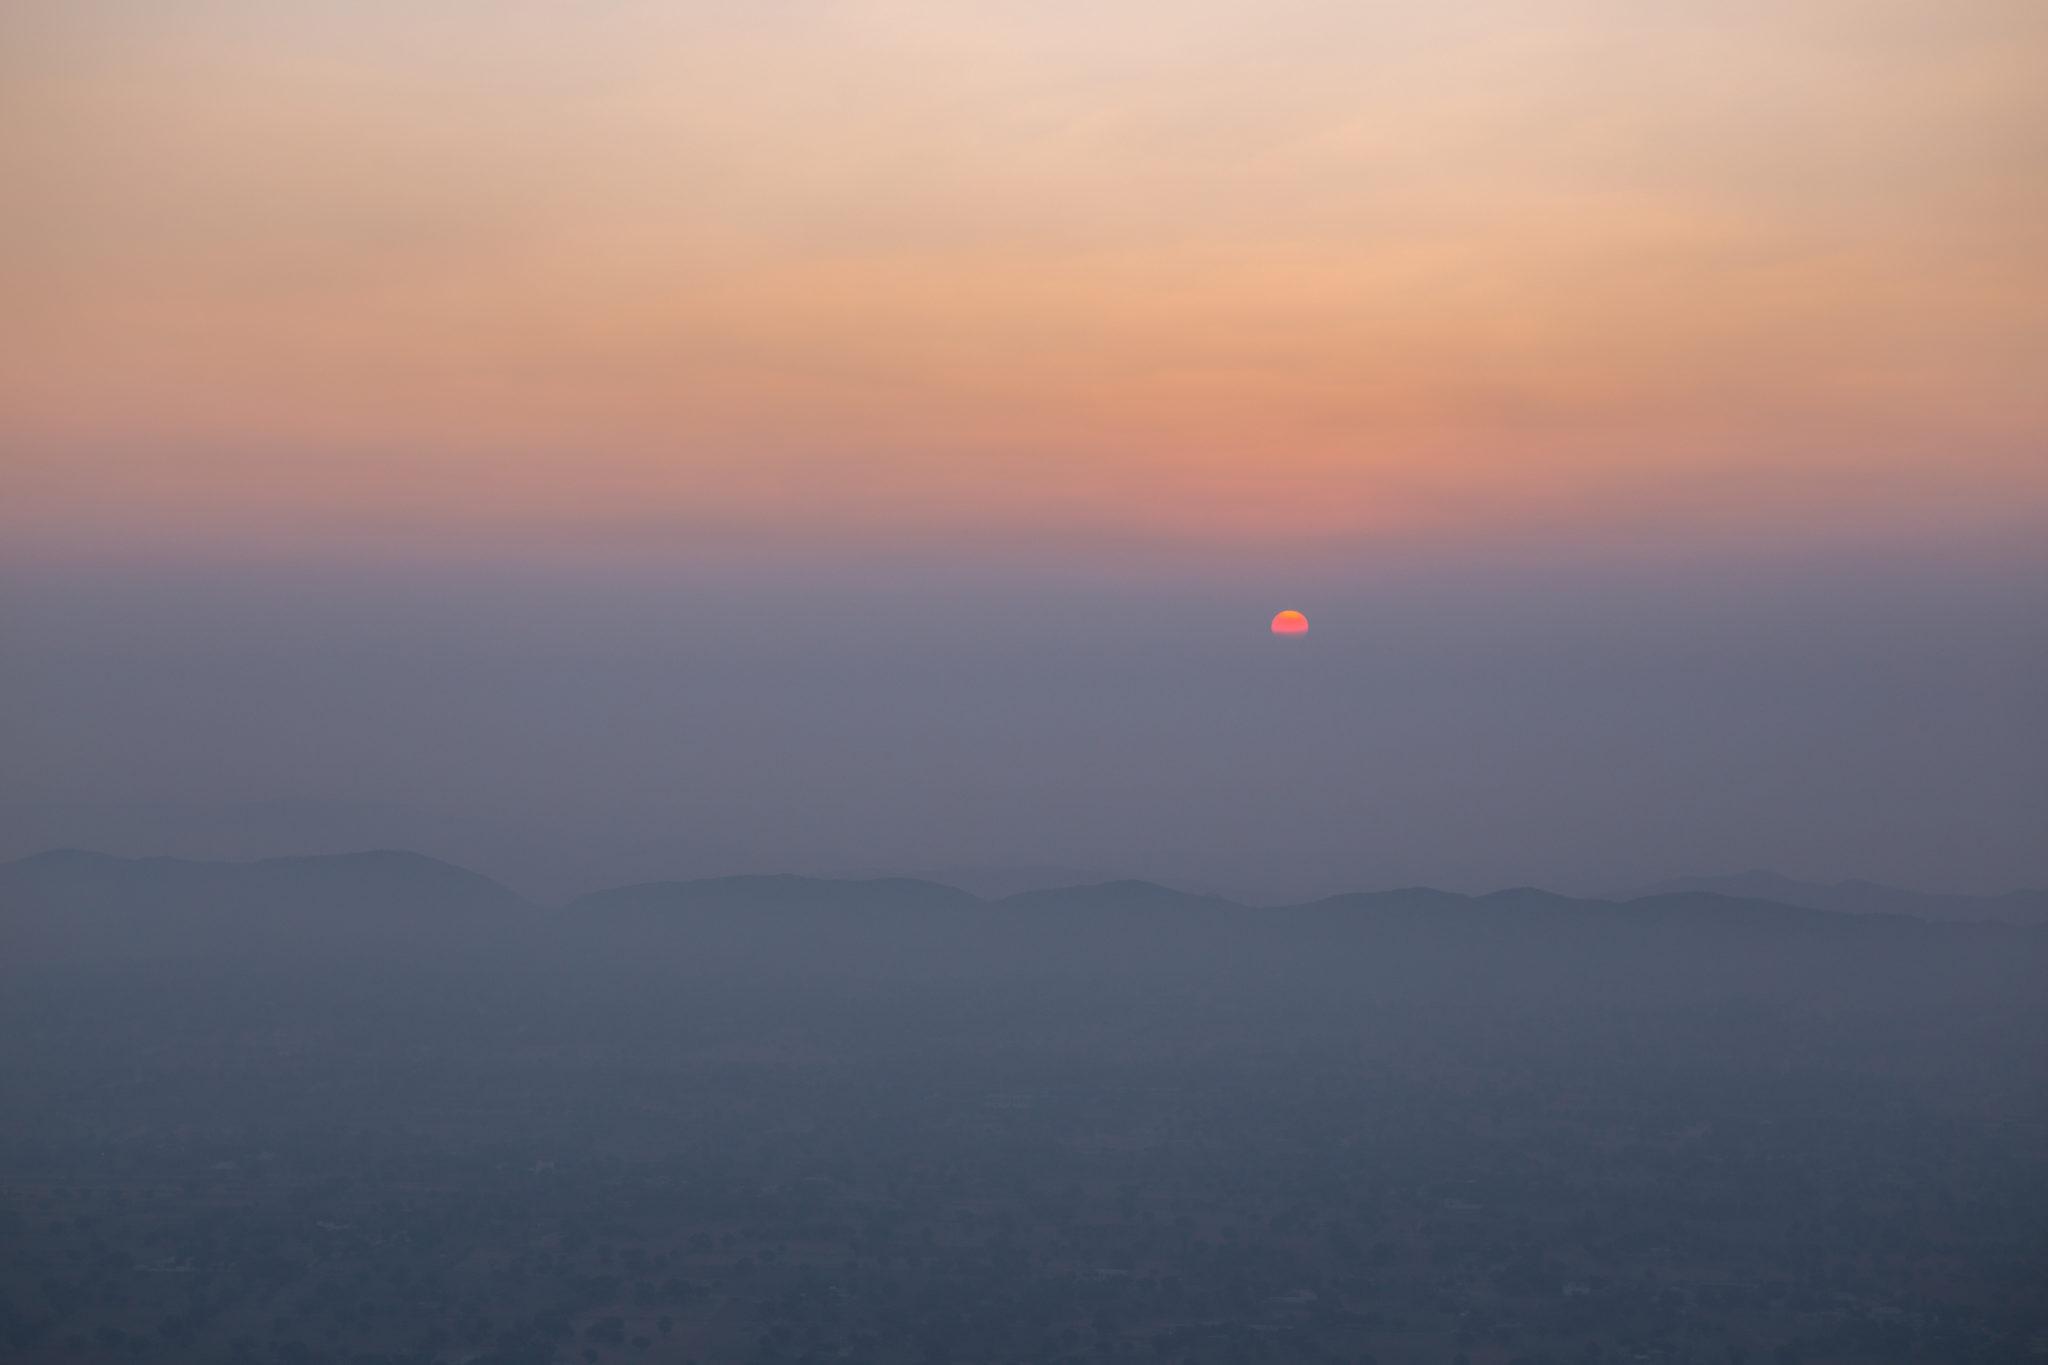 jaipur,inde,montfolière,visite